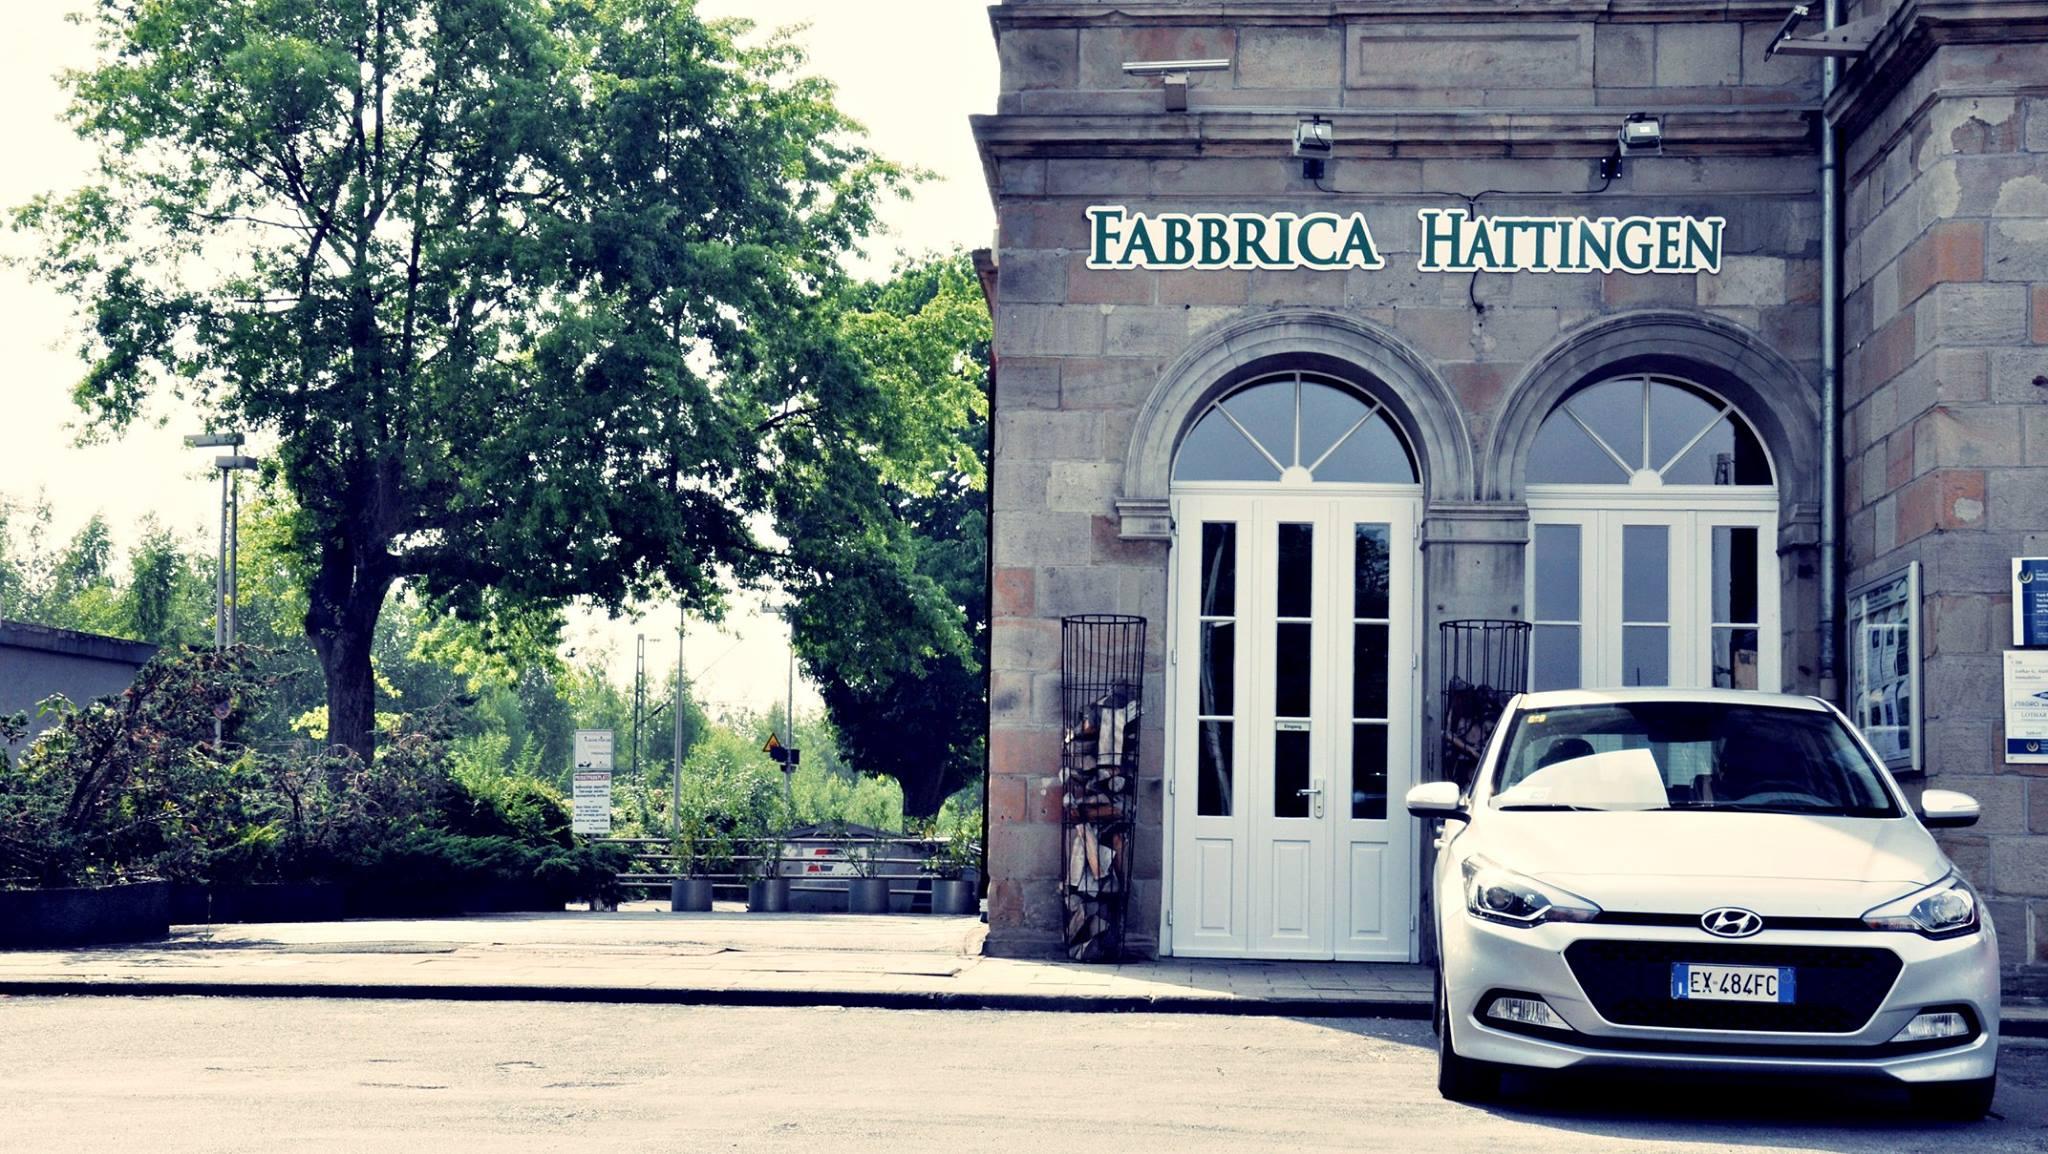 Hyundai i20 - Fabbrica Italiana, Hattingen